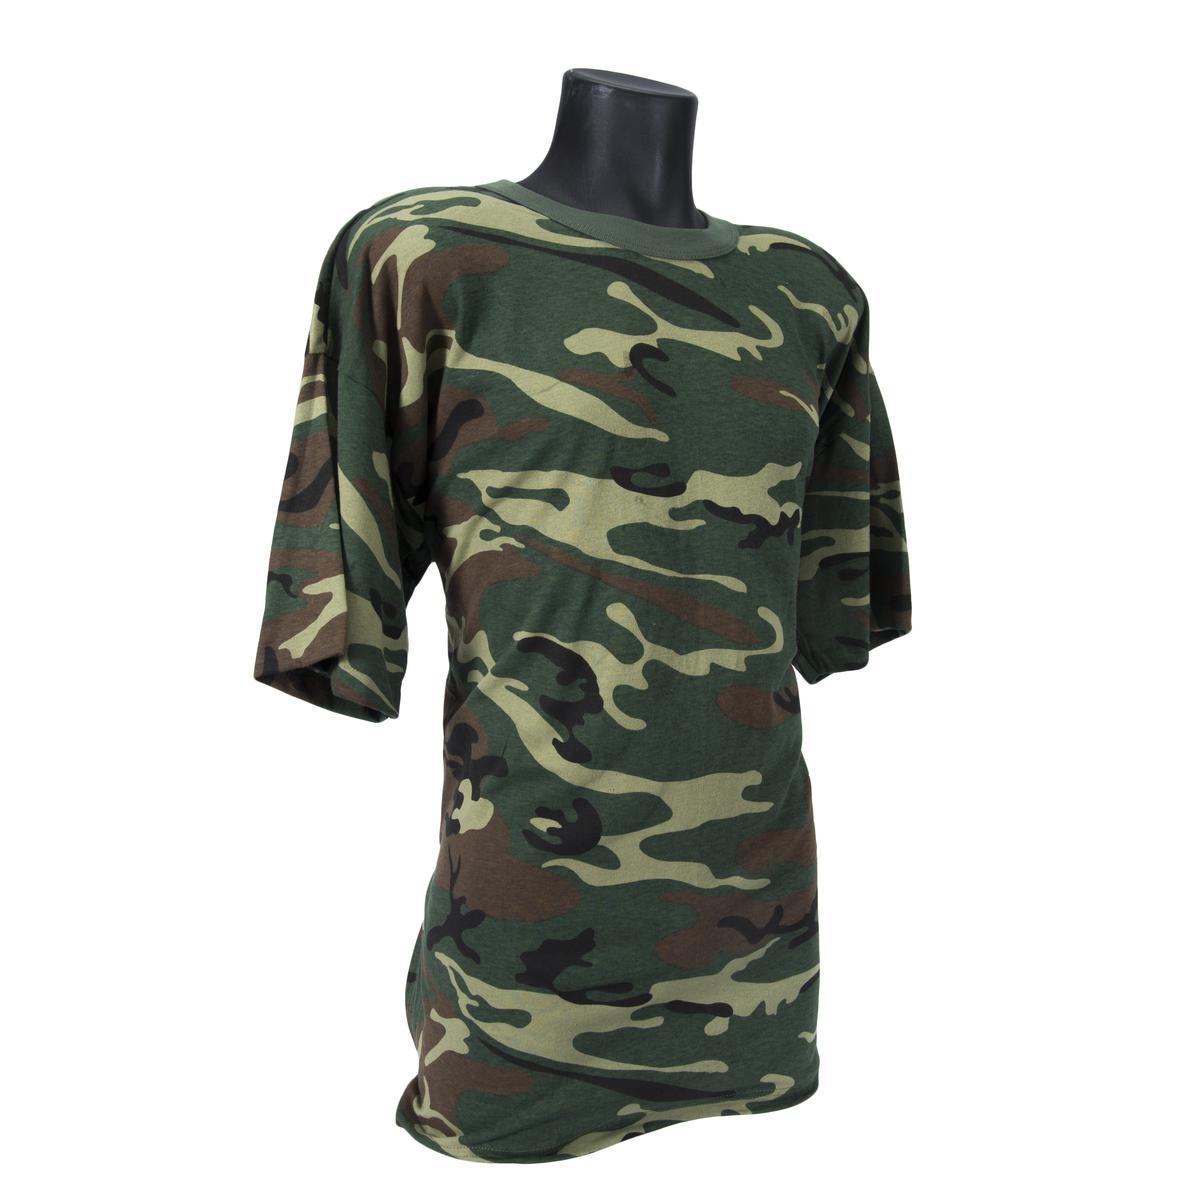 Mens T-Shirt Woodland Camo by Rothco